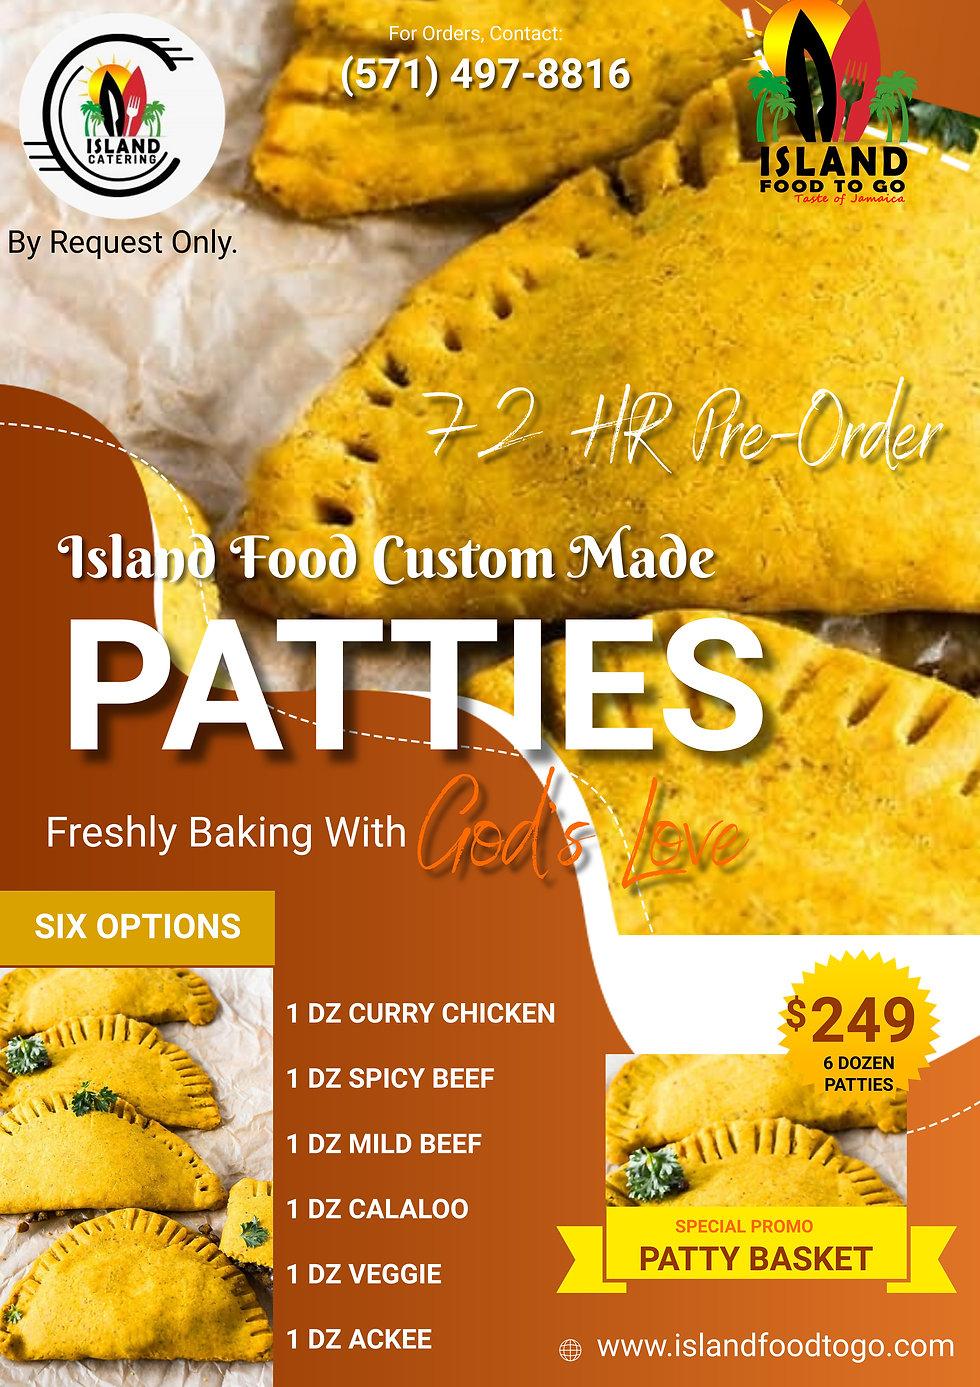 CATERING Patty PastryIFTG Flyer.jpg